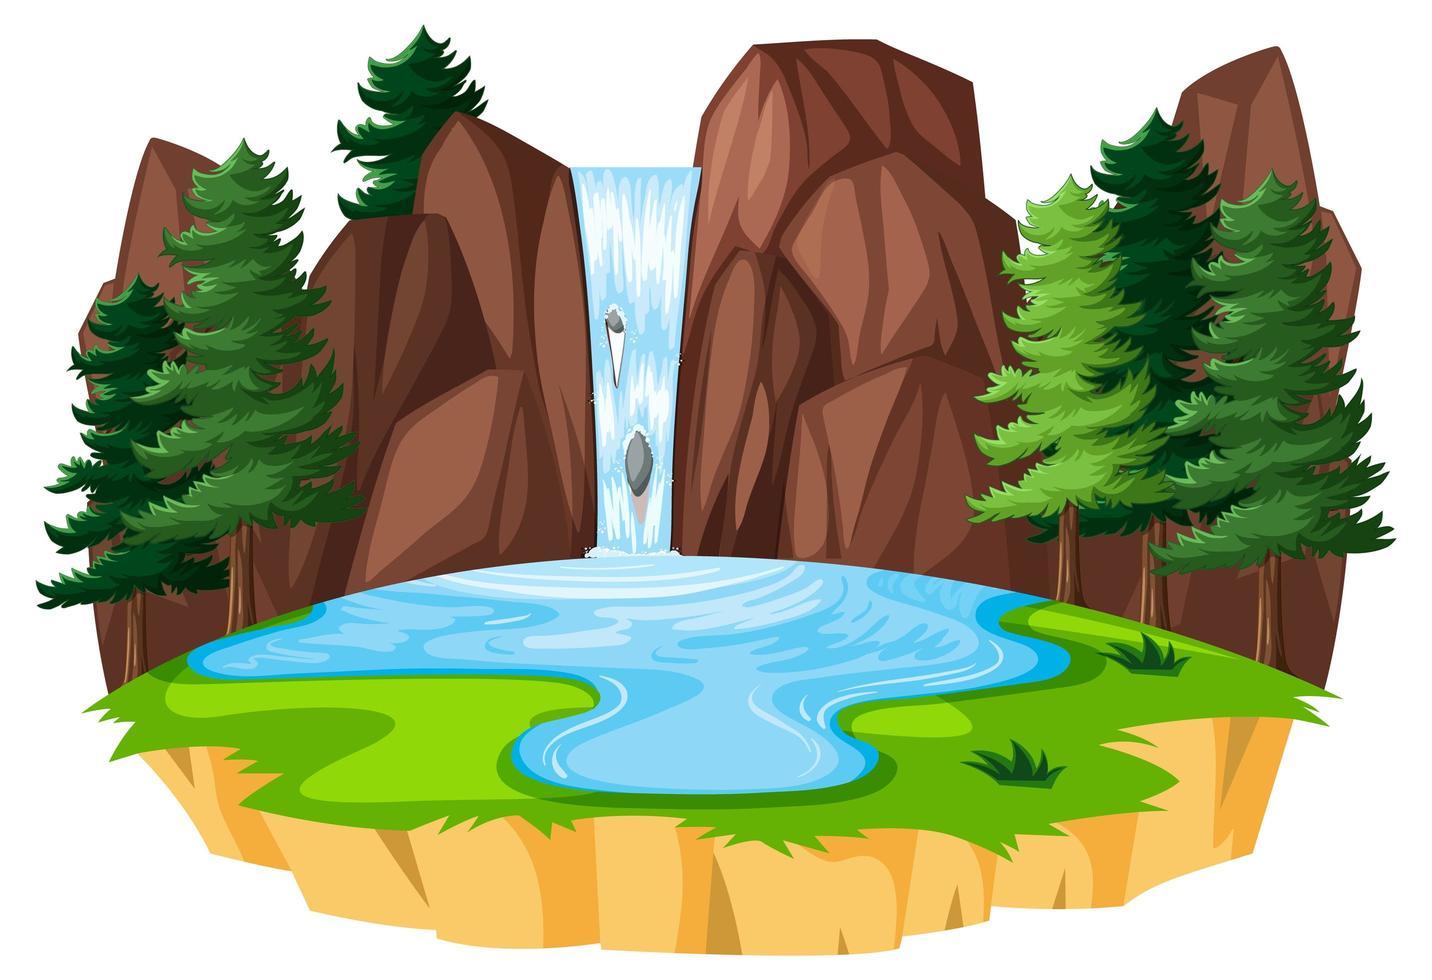 Wasserfall Landschaftsgestaltung vektor